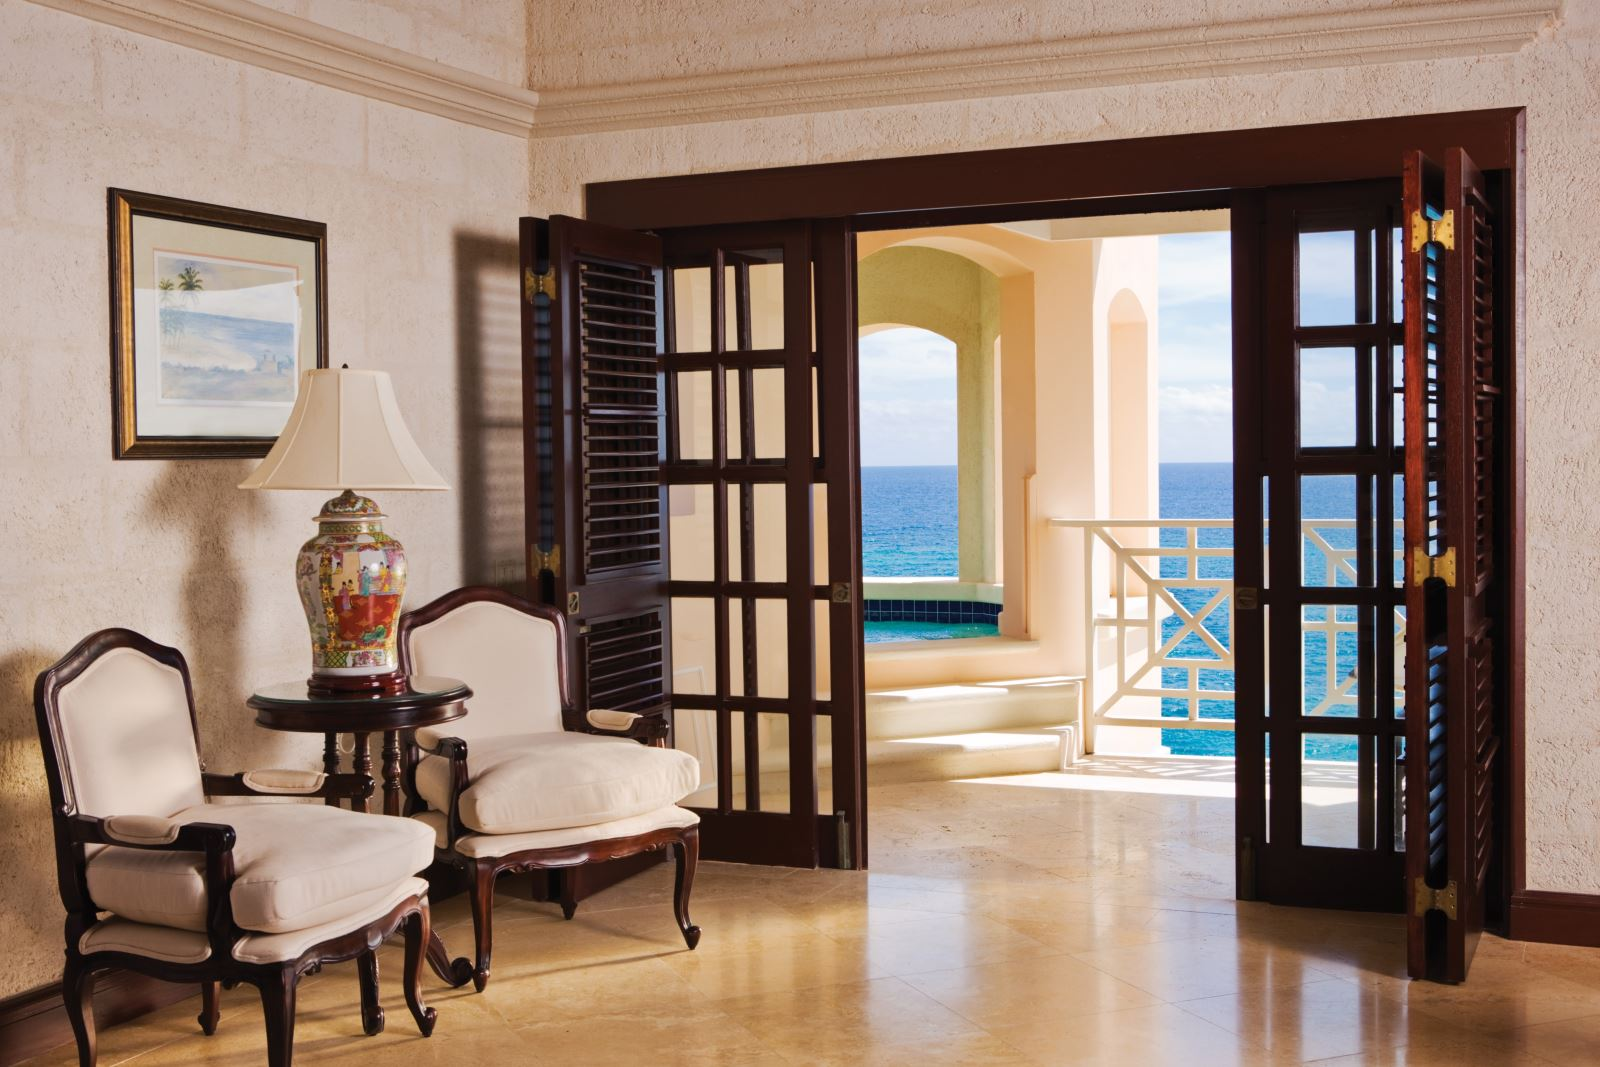 Rooms: Six Barbados Hotels As Rihanna Celebrates Her Birthday